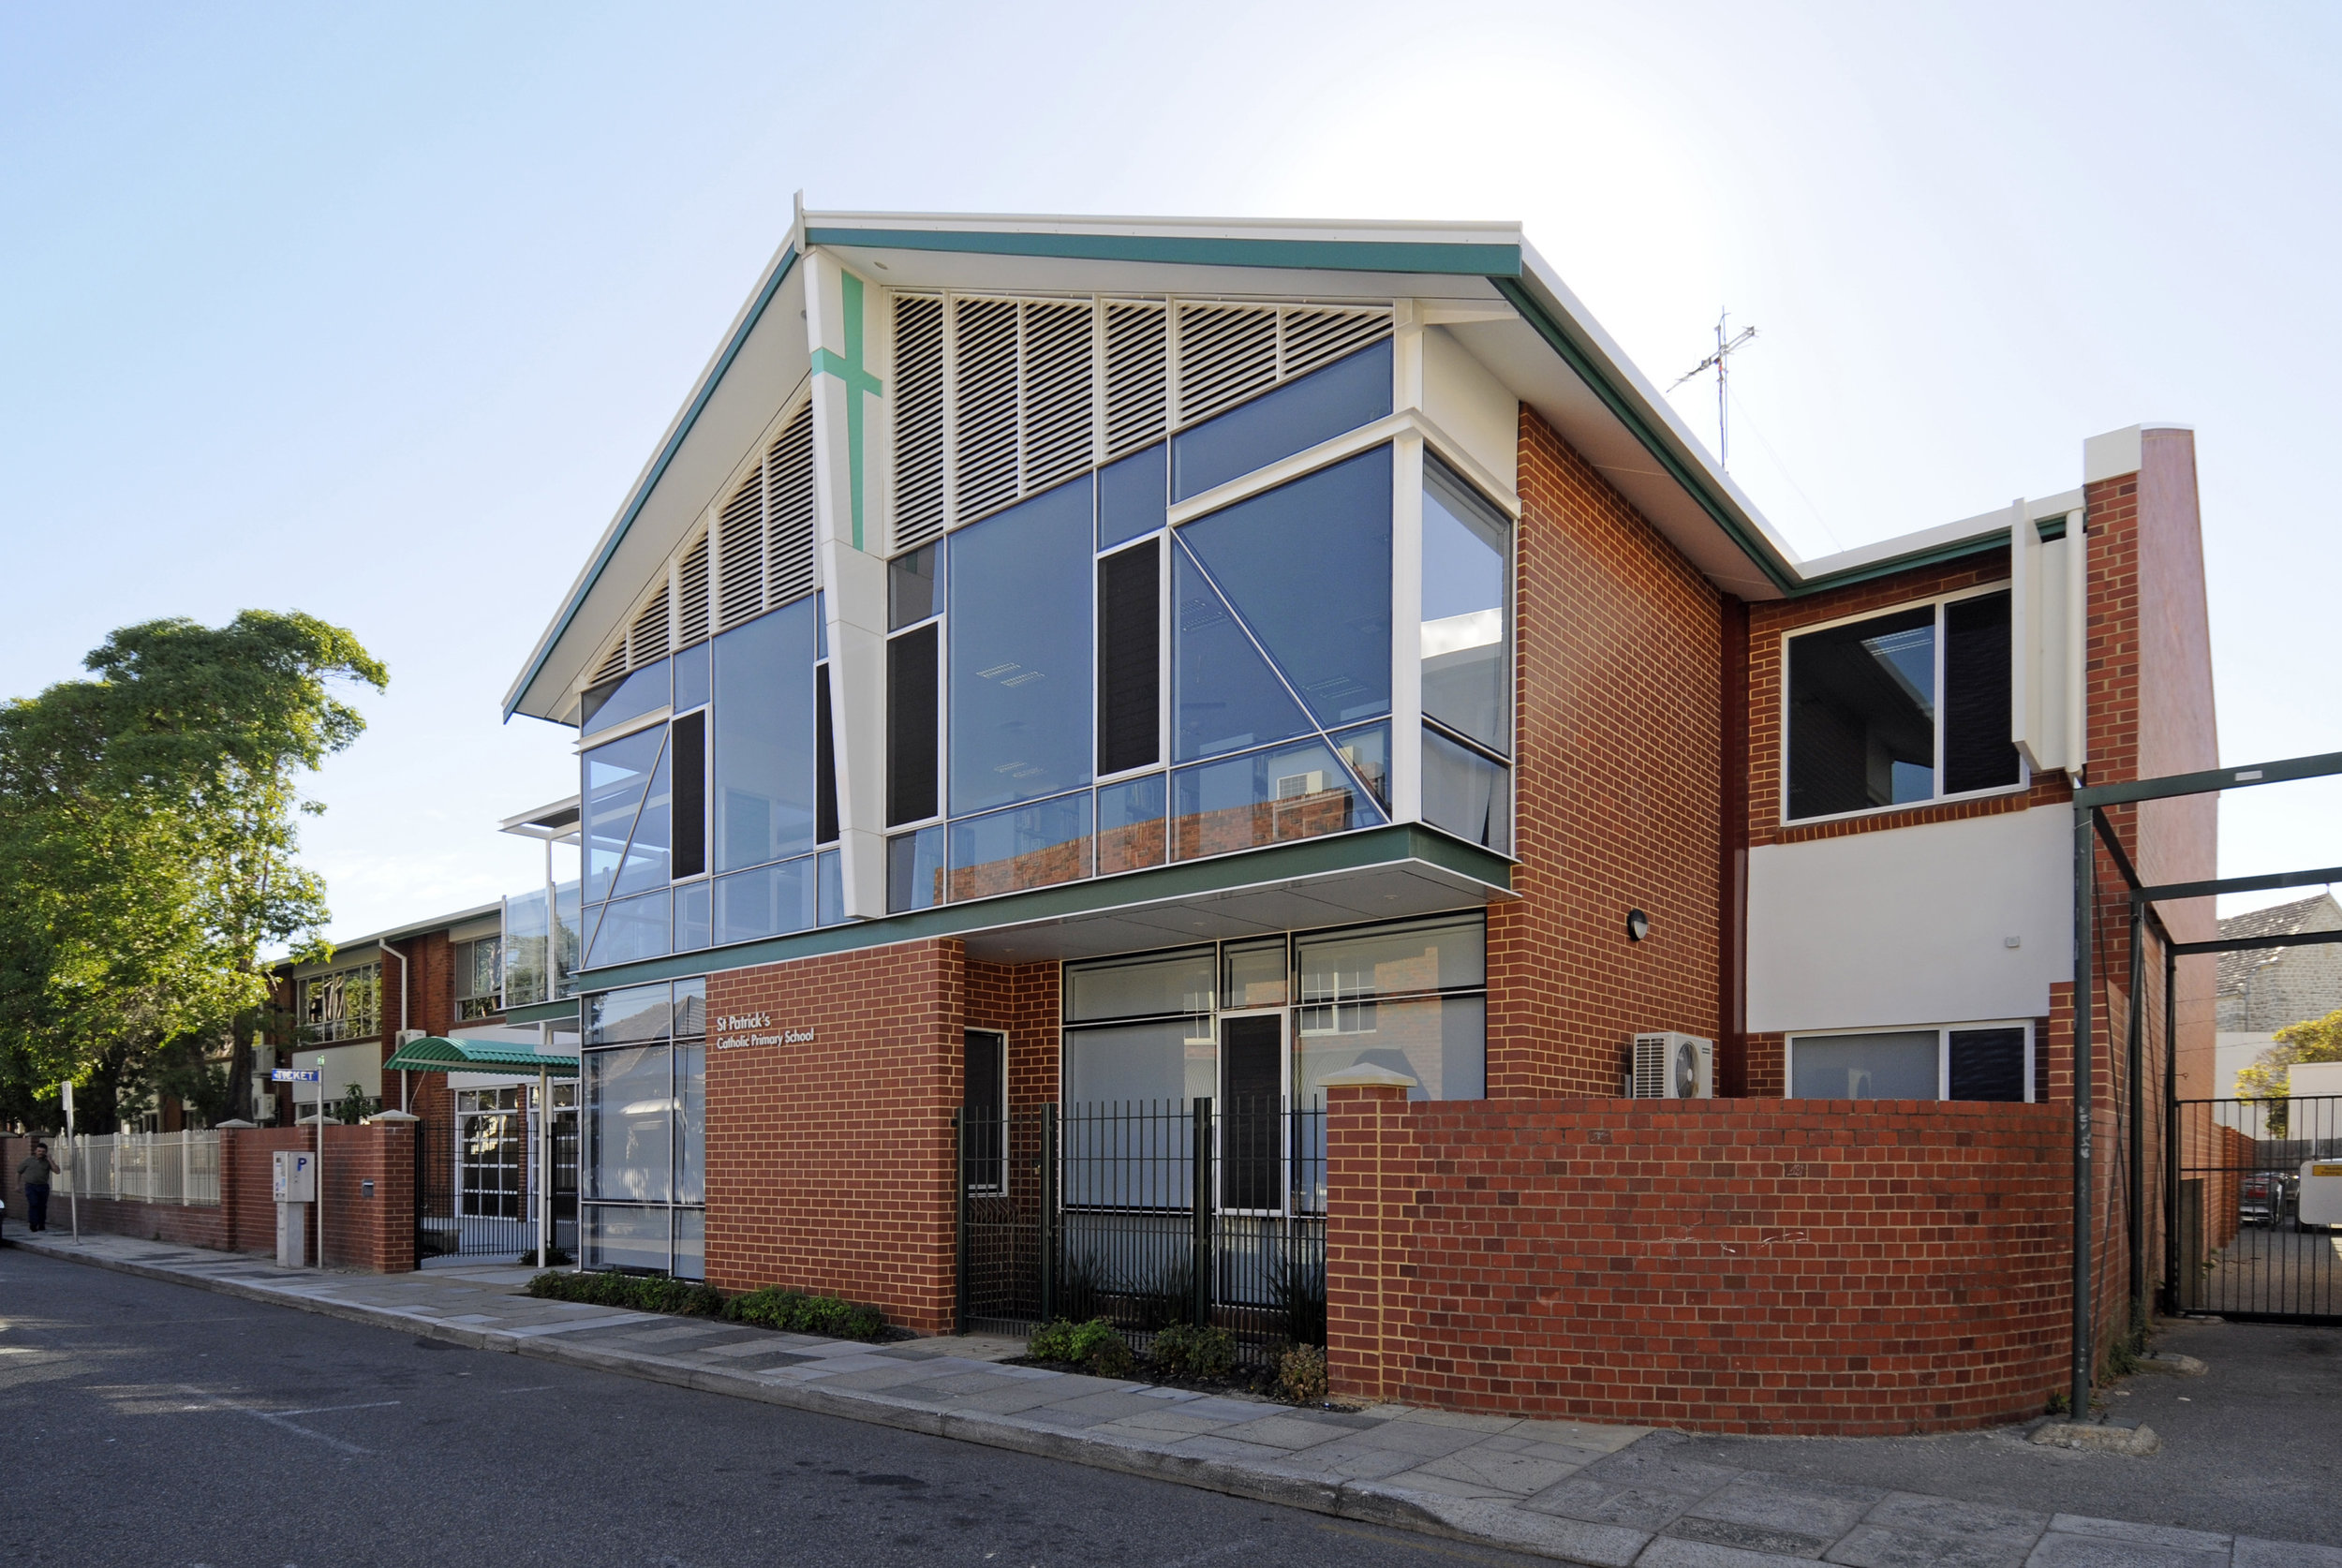 2011 Fremantle heritage festival award   compatible infill development   winnerst patrick's primary school -